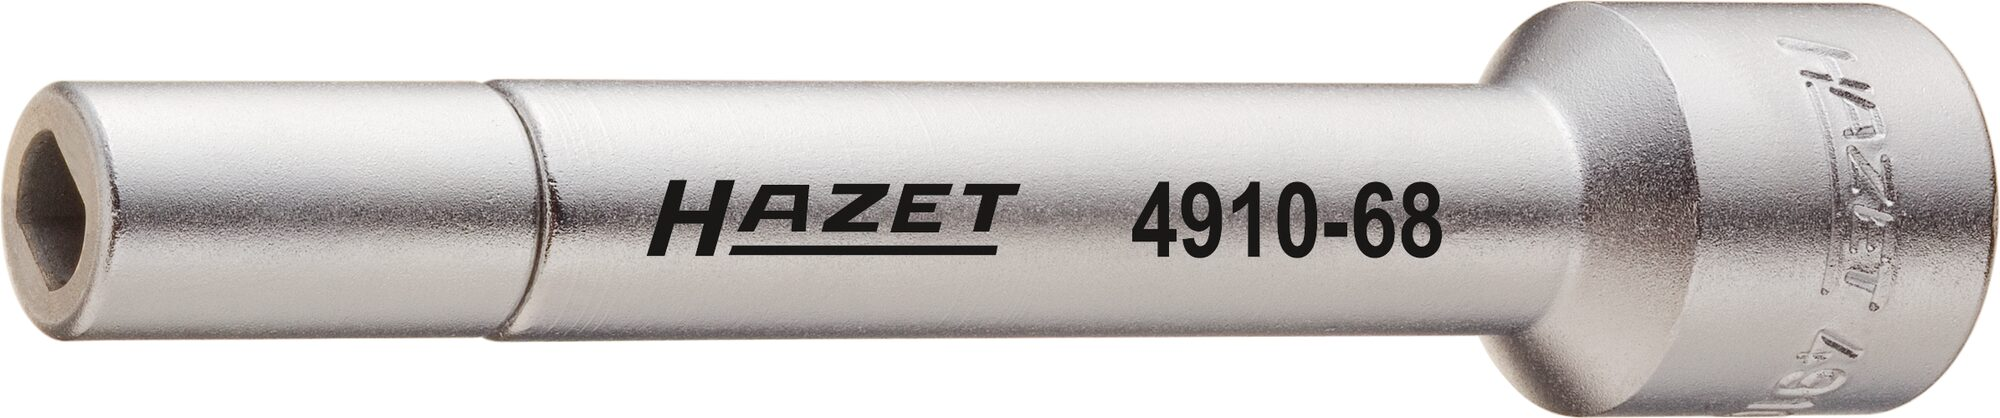 HAZET Verlängerung 4910-58 ∙ Vierkant hohl 12,5 mm (1/2 Zoll) ∙ Zapfenprofil hohl ∙ Außensicherung 5 x 8 mm